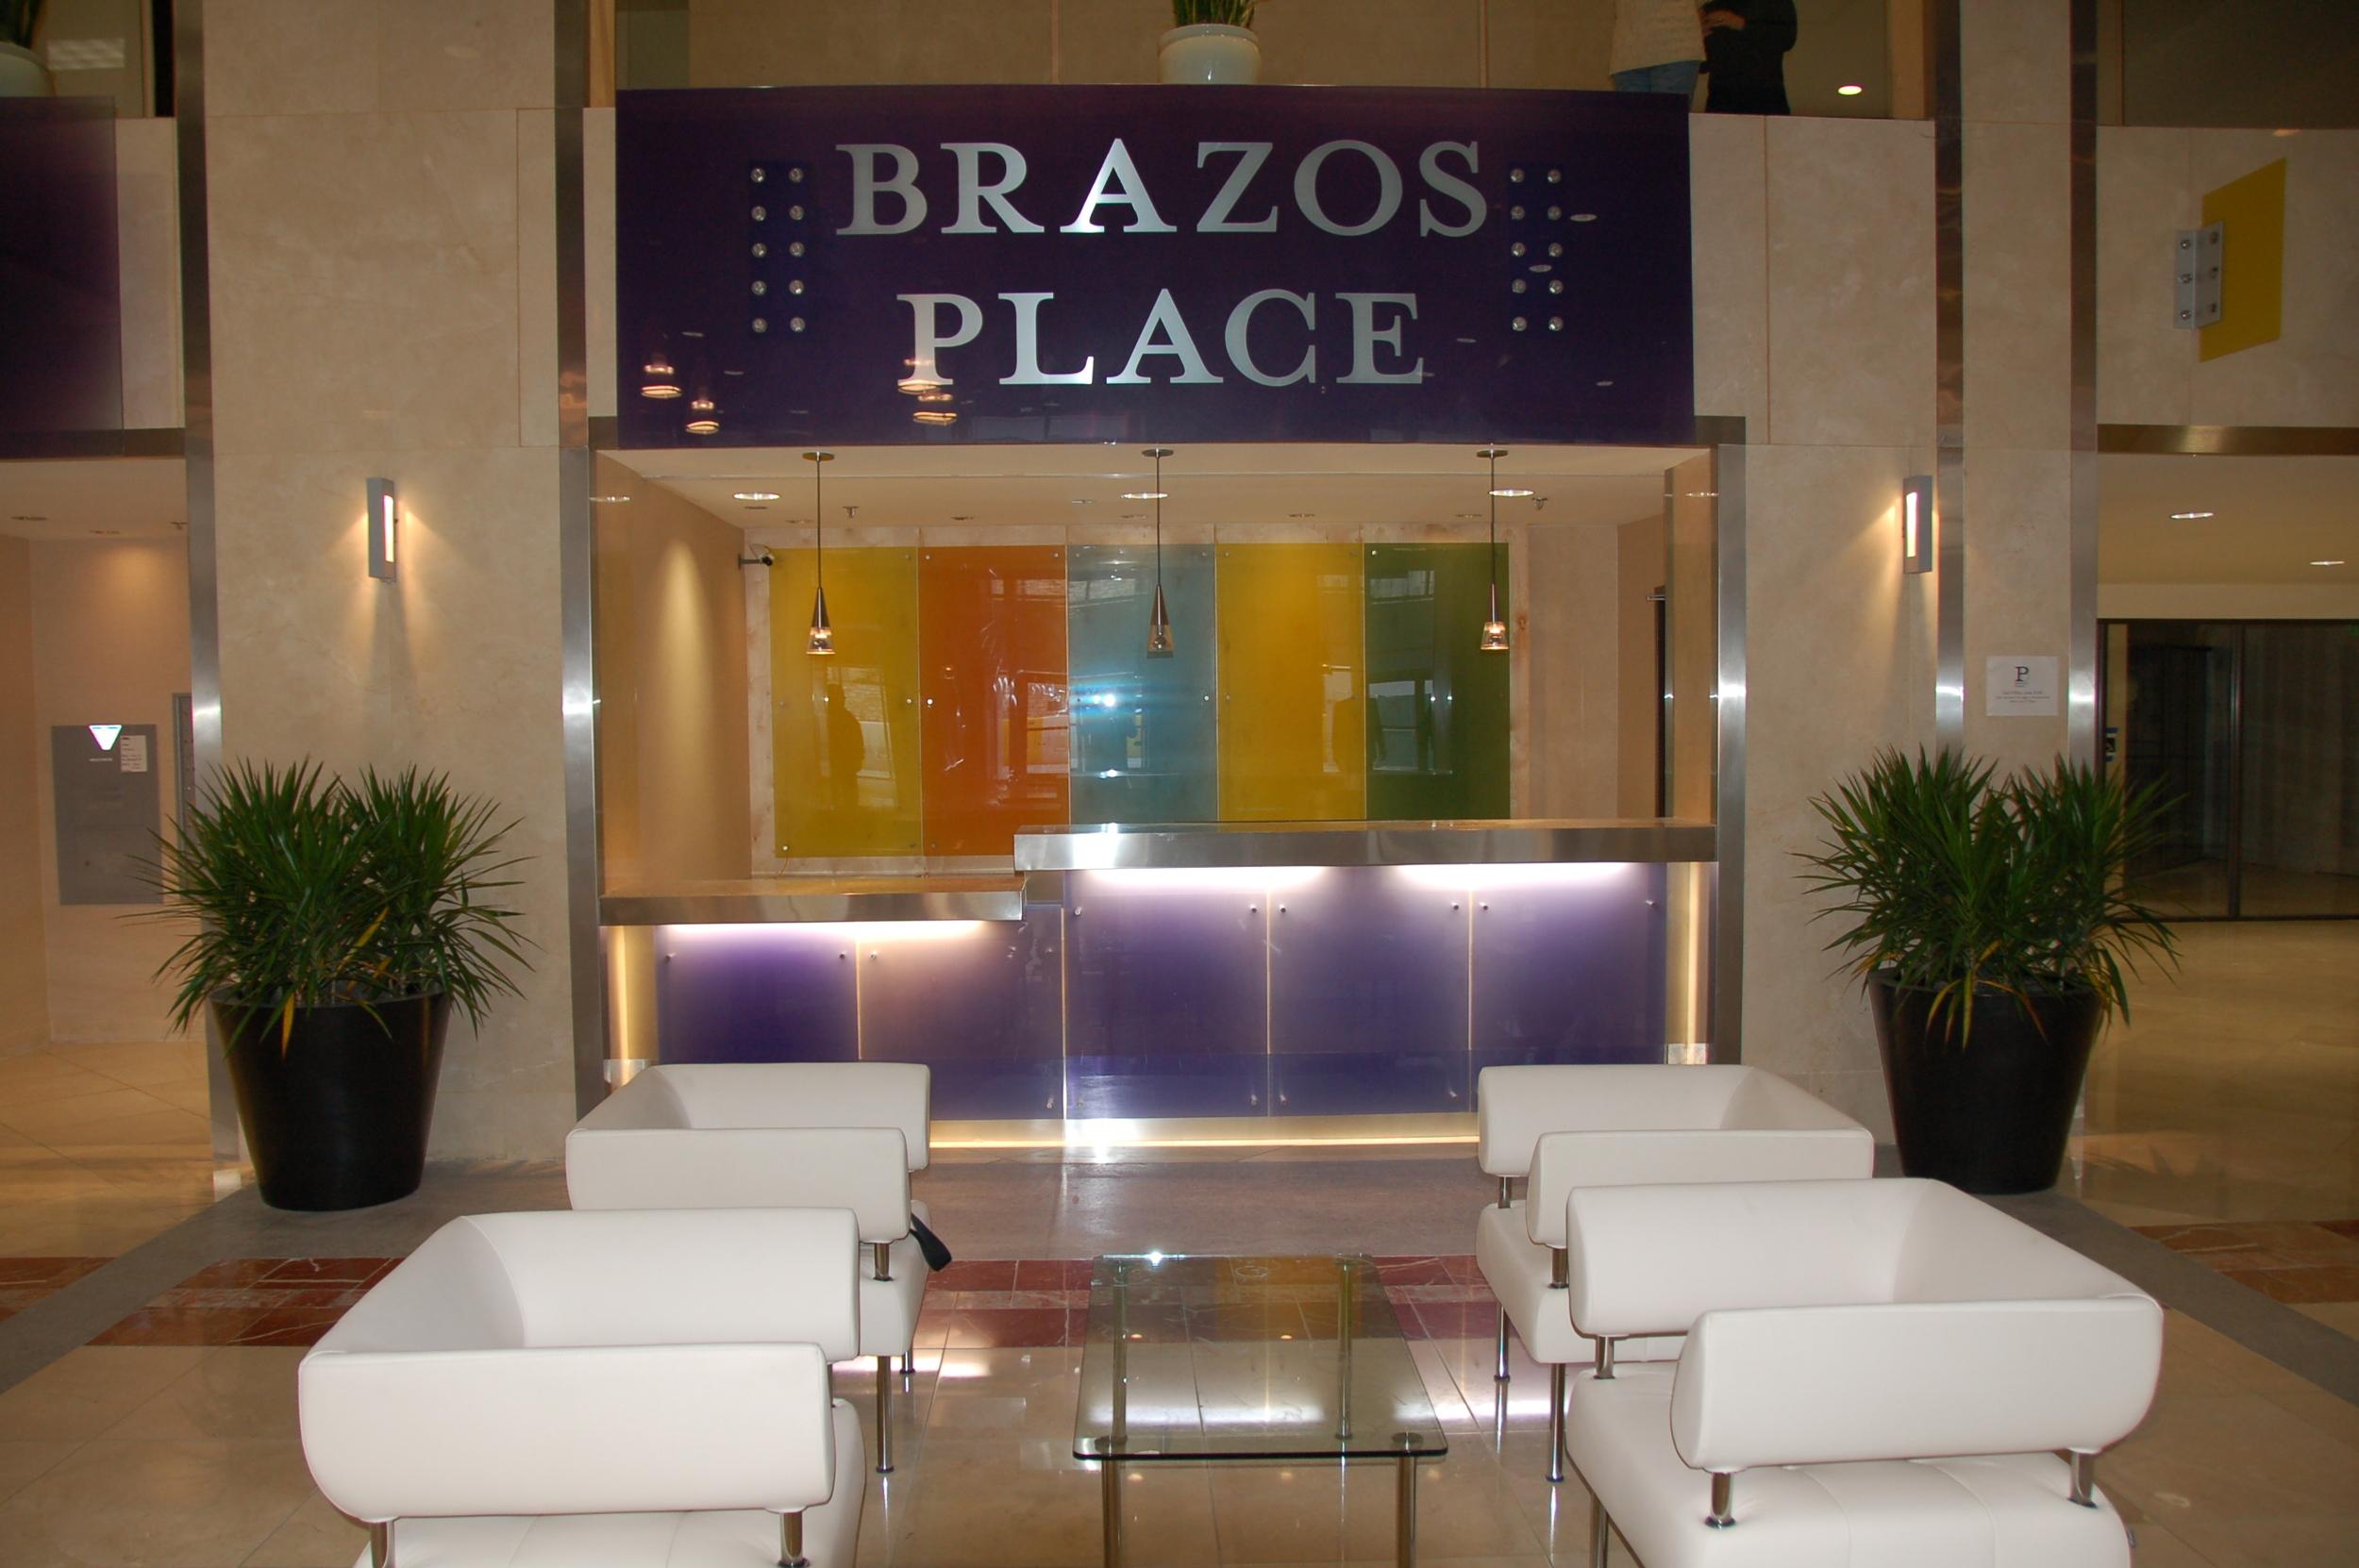 Brazos Main Lobby Concierge Desk.JPG